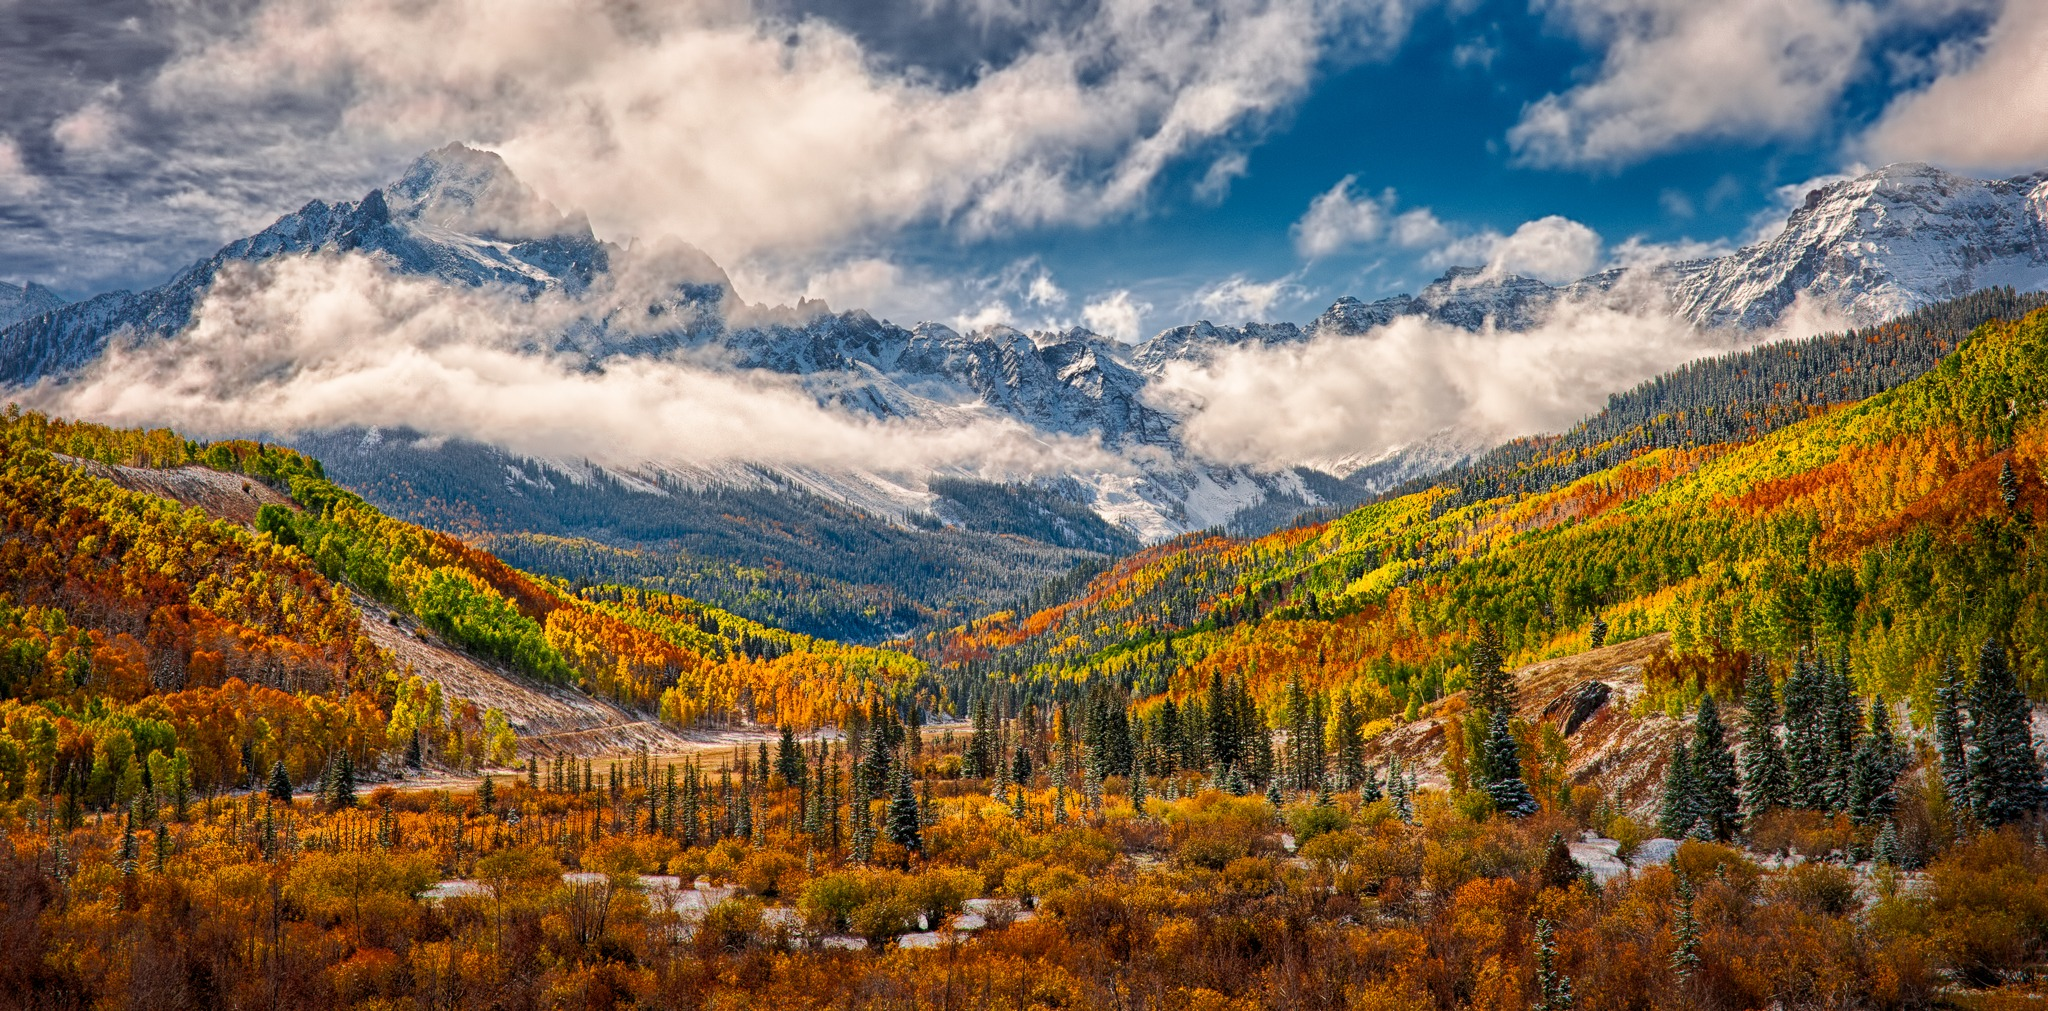 Fall Birch Tree Wallpaper Aspens And Oak Display Blazing Autumn Colors In Colorado